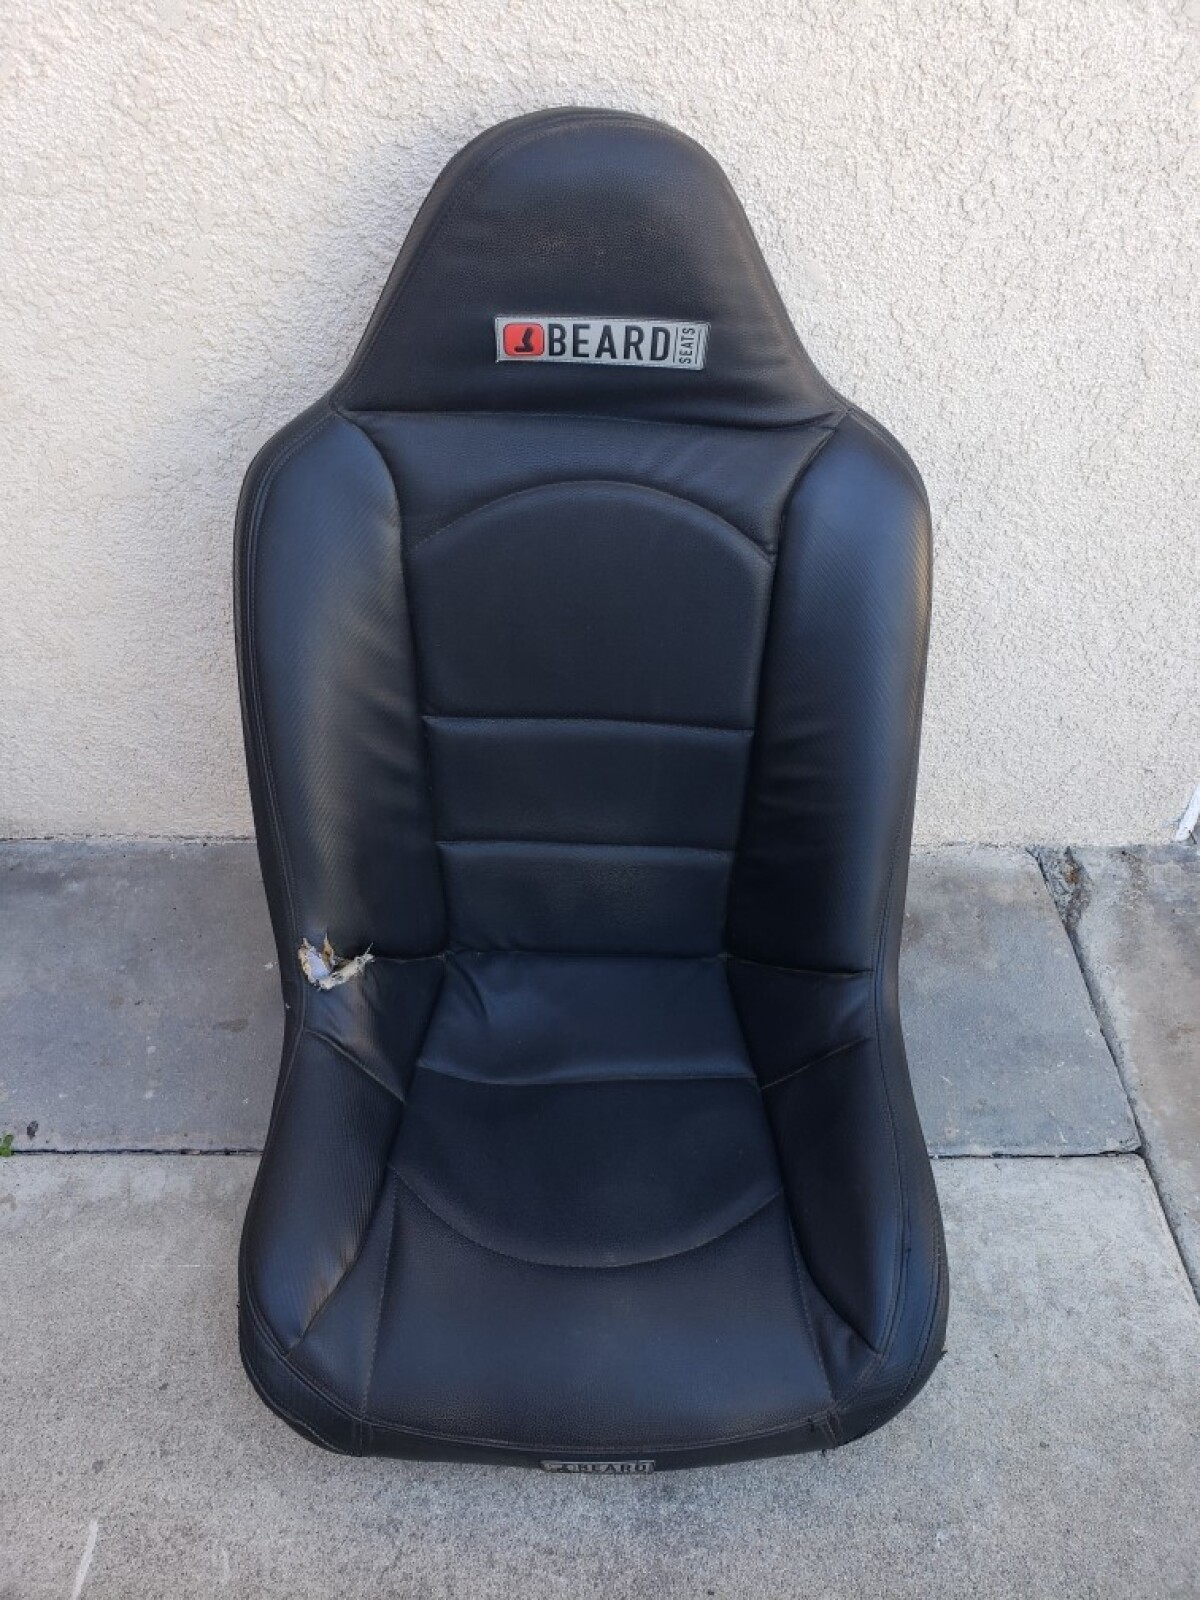 For Sale: Beard Racing Seat - photo0